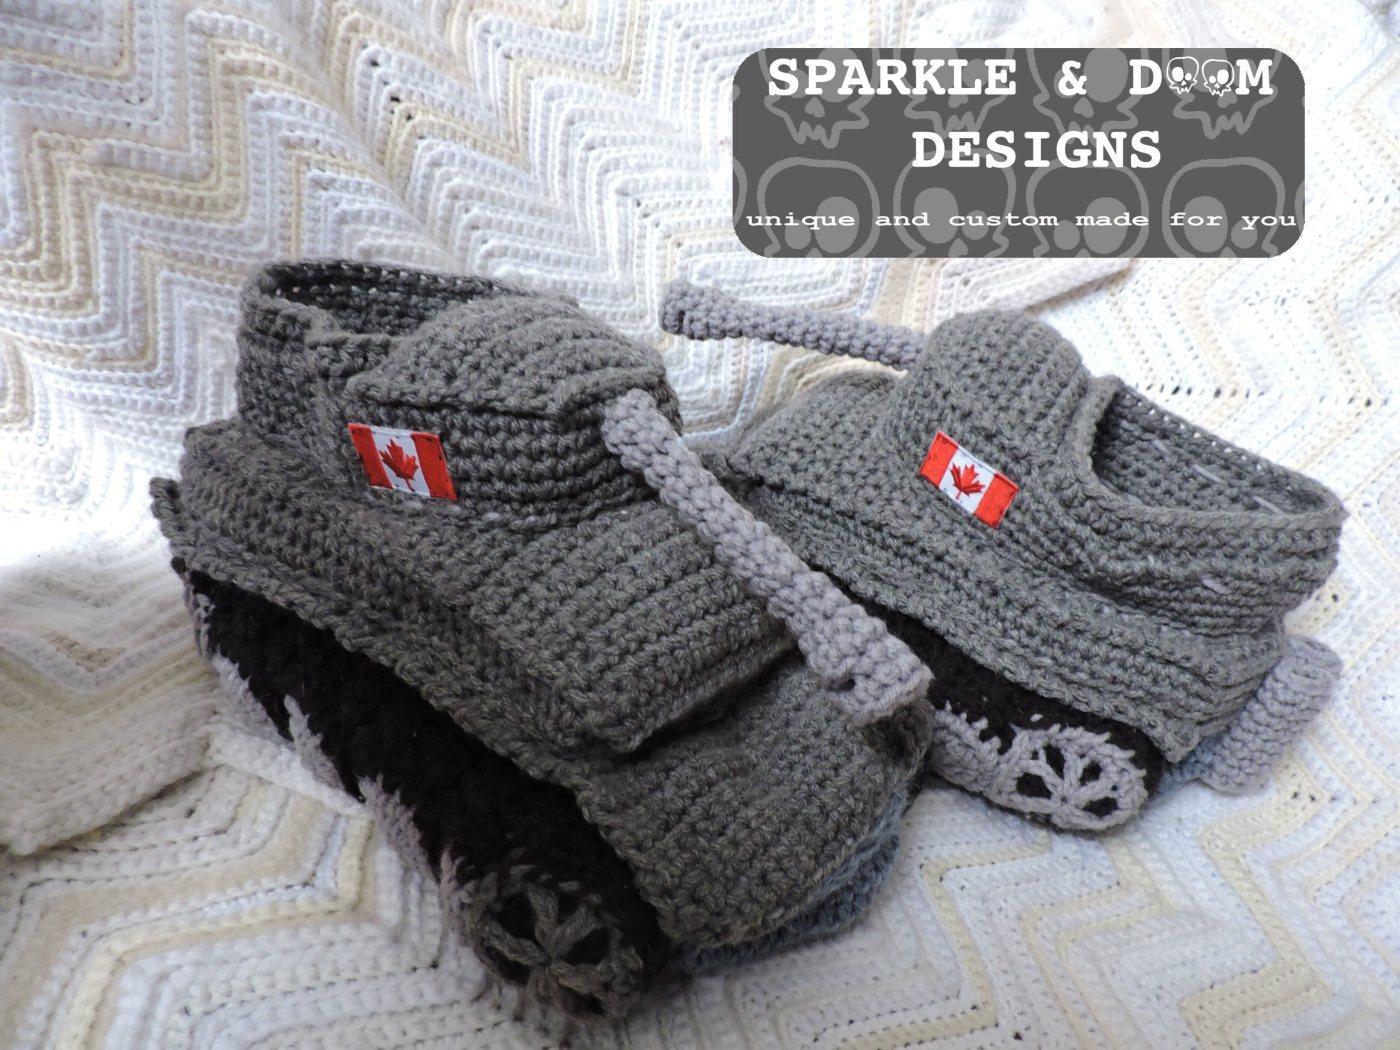 Tank Slippers Sparkle Doom Designs